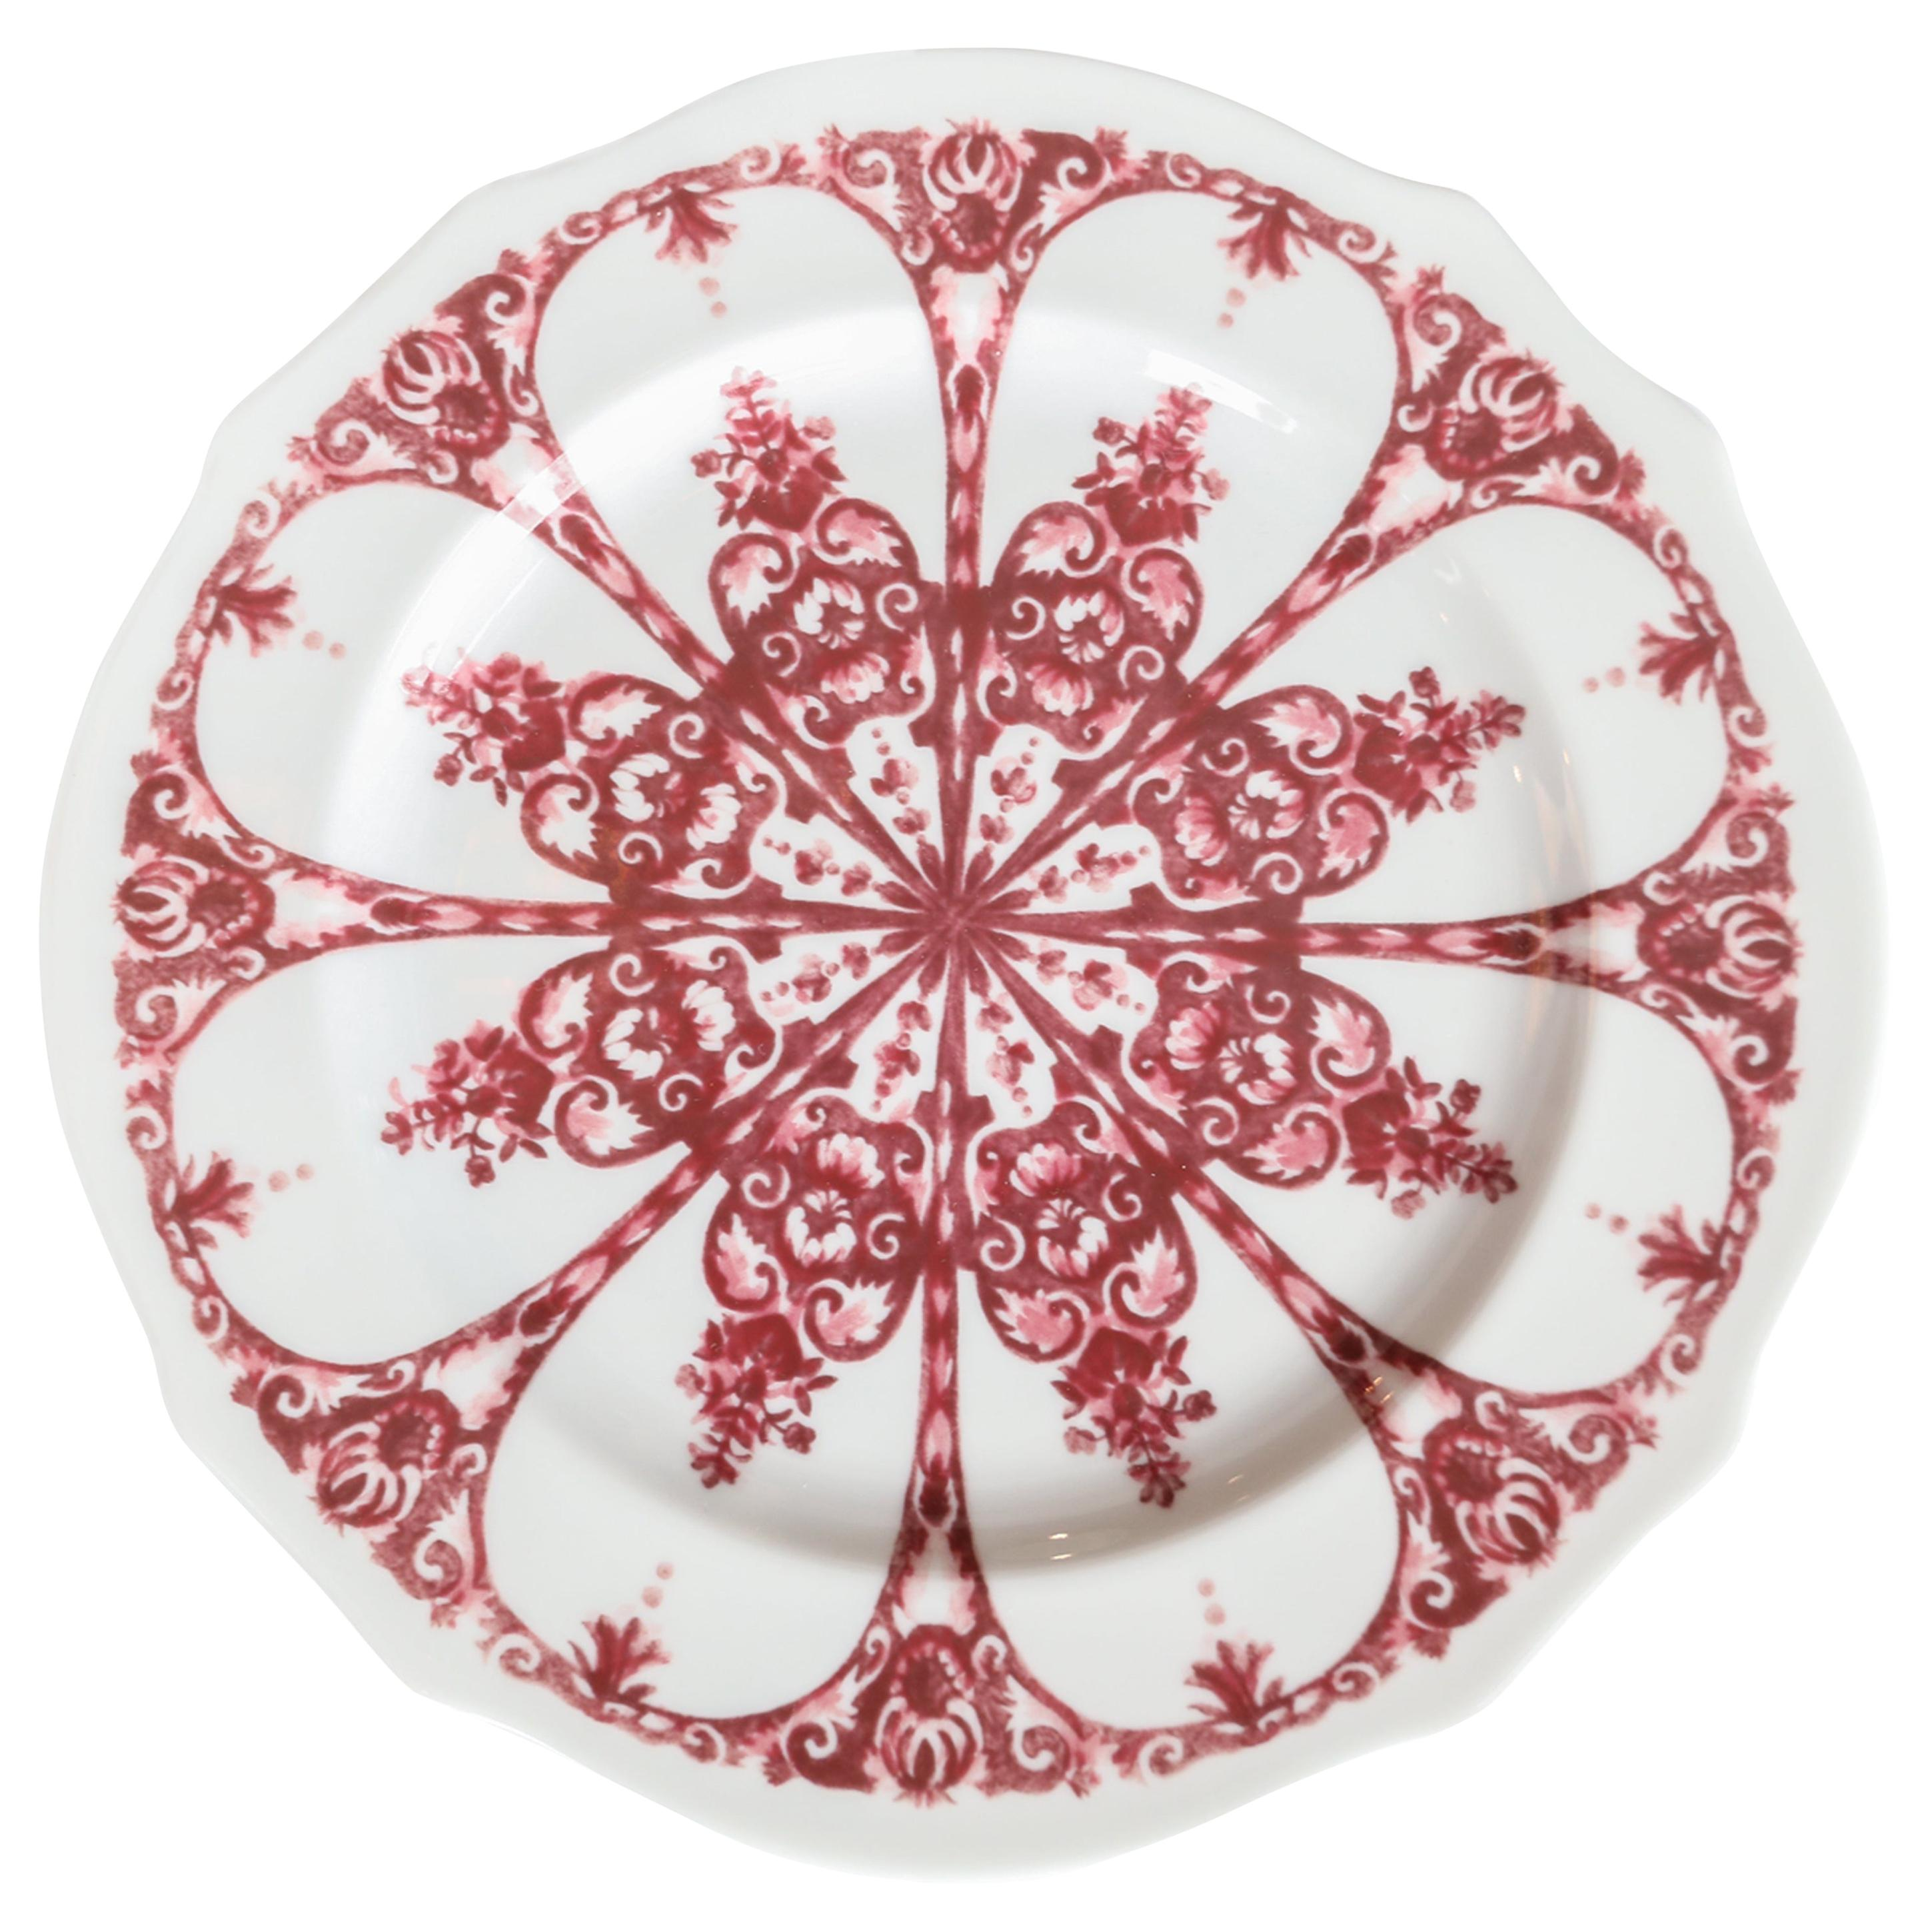 Richard Ginori Babele Rosso Red Dessert Plate